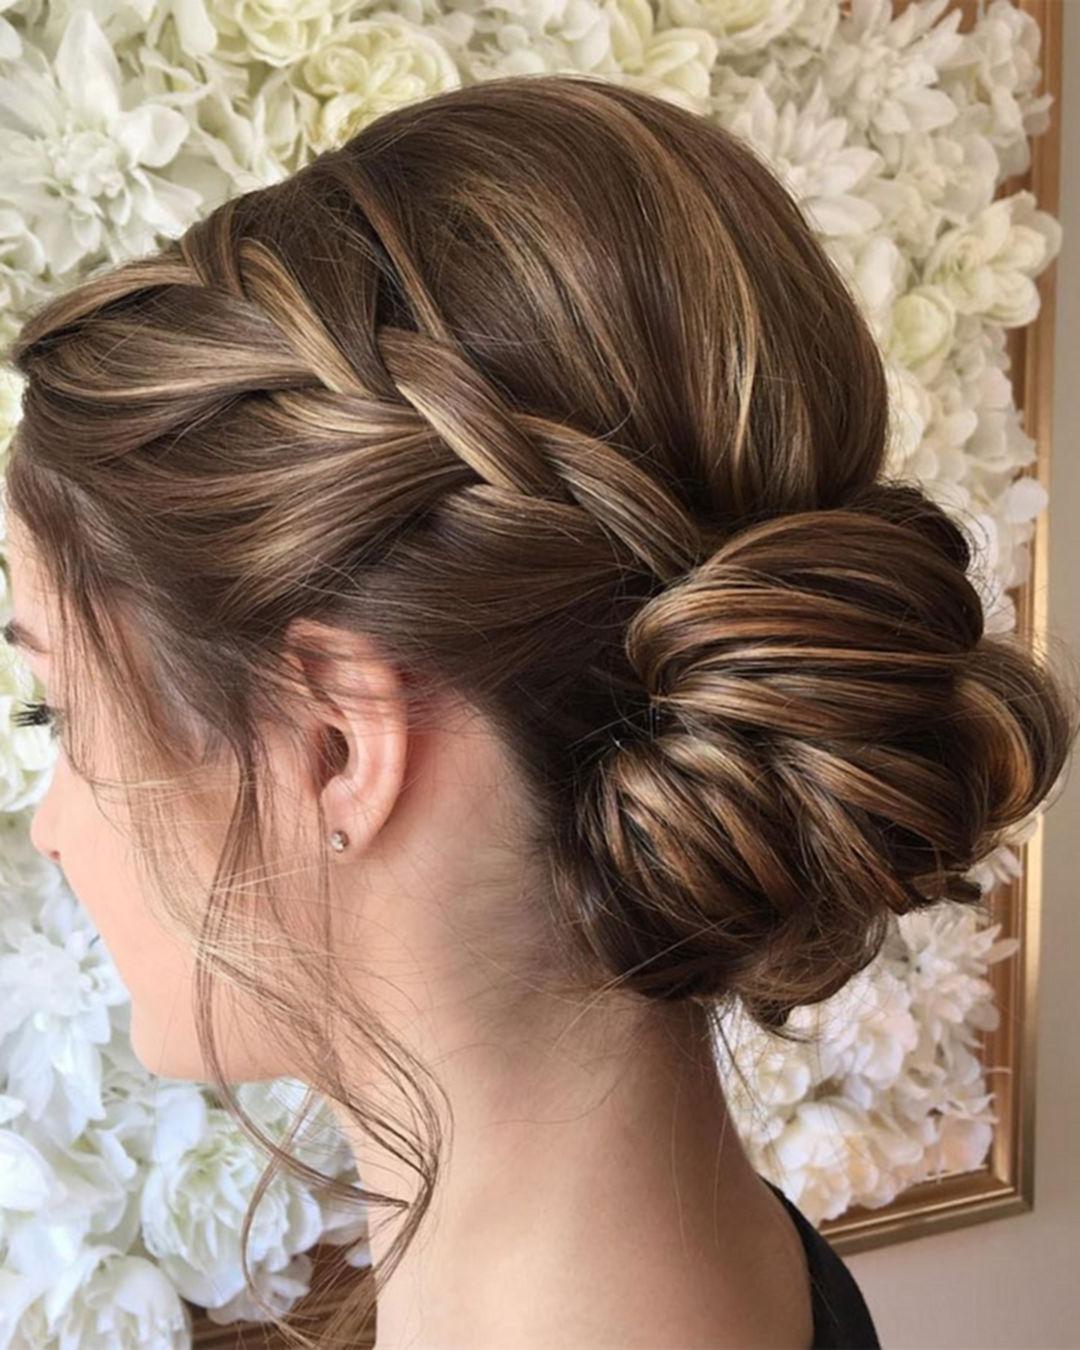 60+ Wonderful Bridesmaid Updo Hairstyles | Bridesmaid Updo In Hairstyles For Bridesmaids Updos (View 2 of 15)